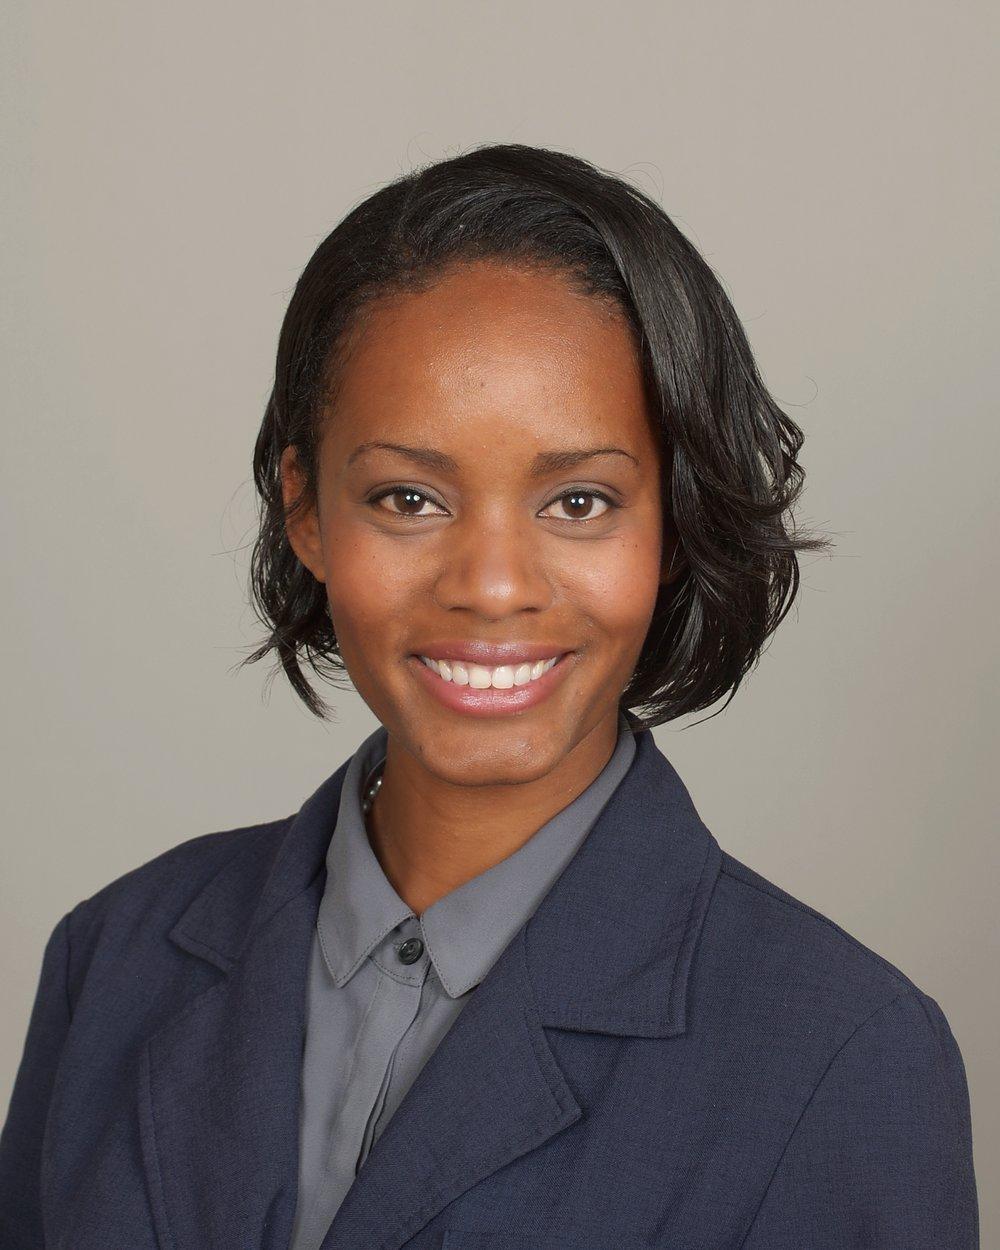 Angele Labastide, MD Candidate